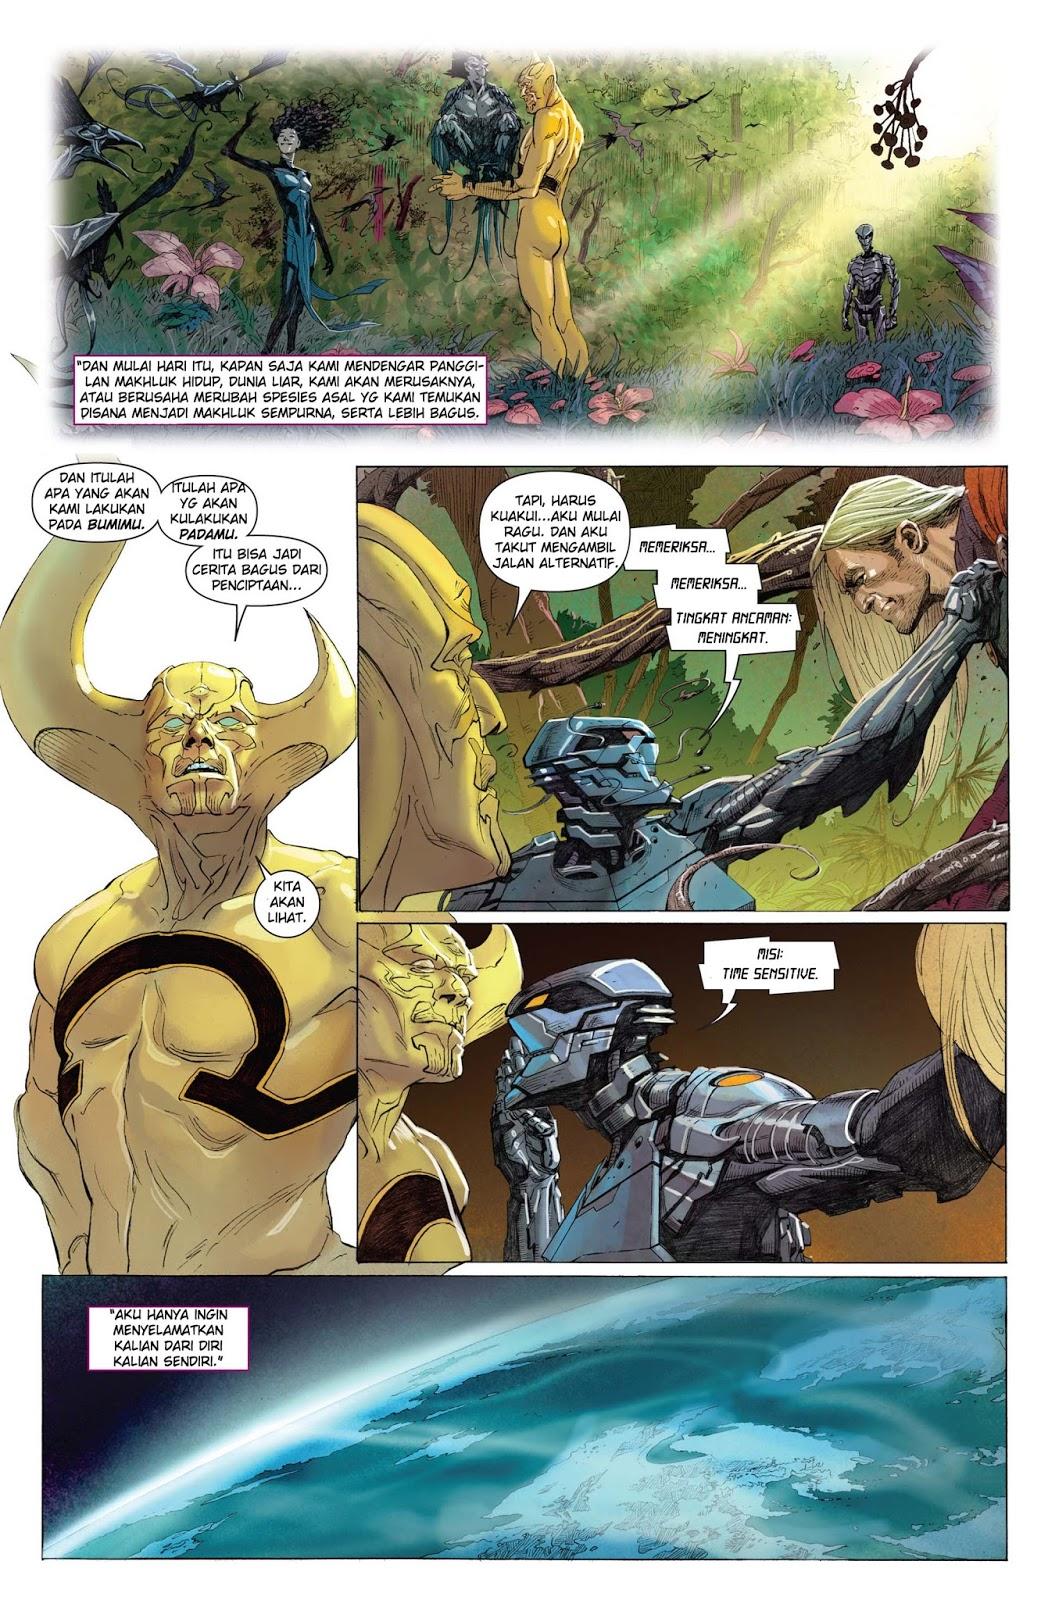 komik the avengers #2 (2012) - komik pos - baca komik